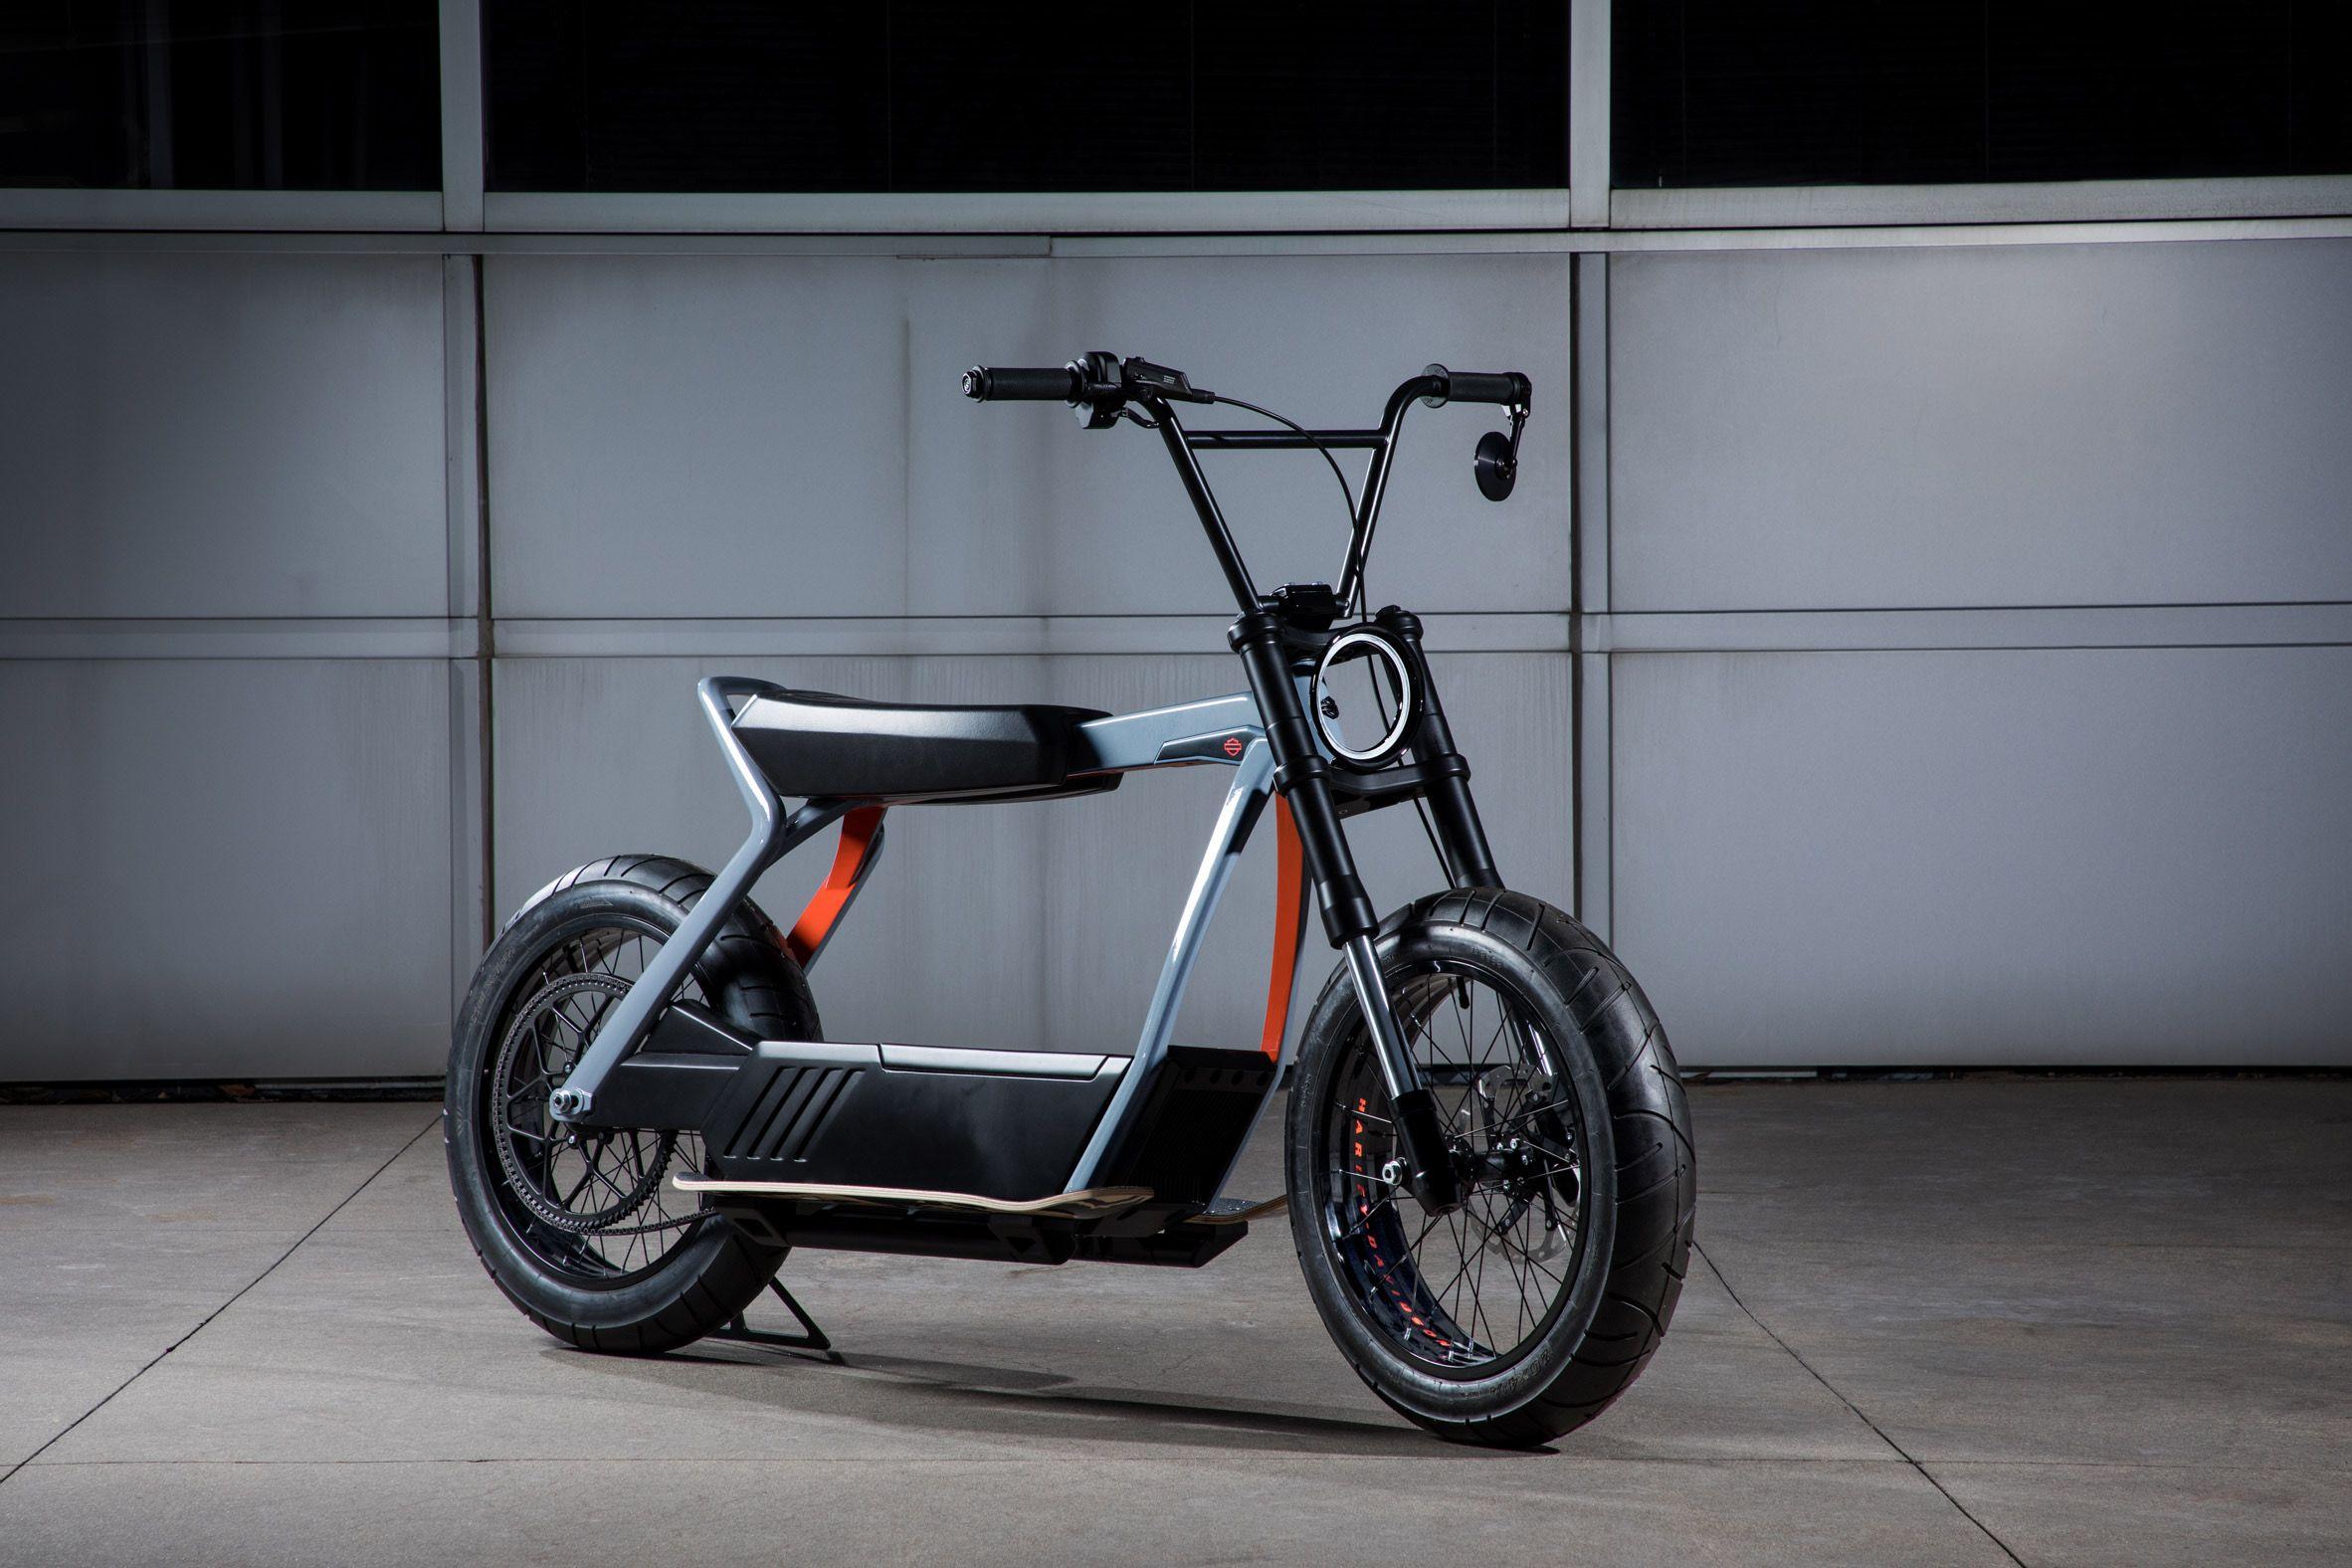 Harley Davidson Electric Commuter Bike